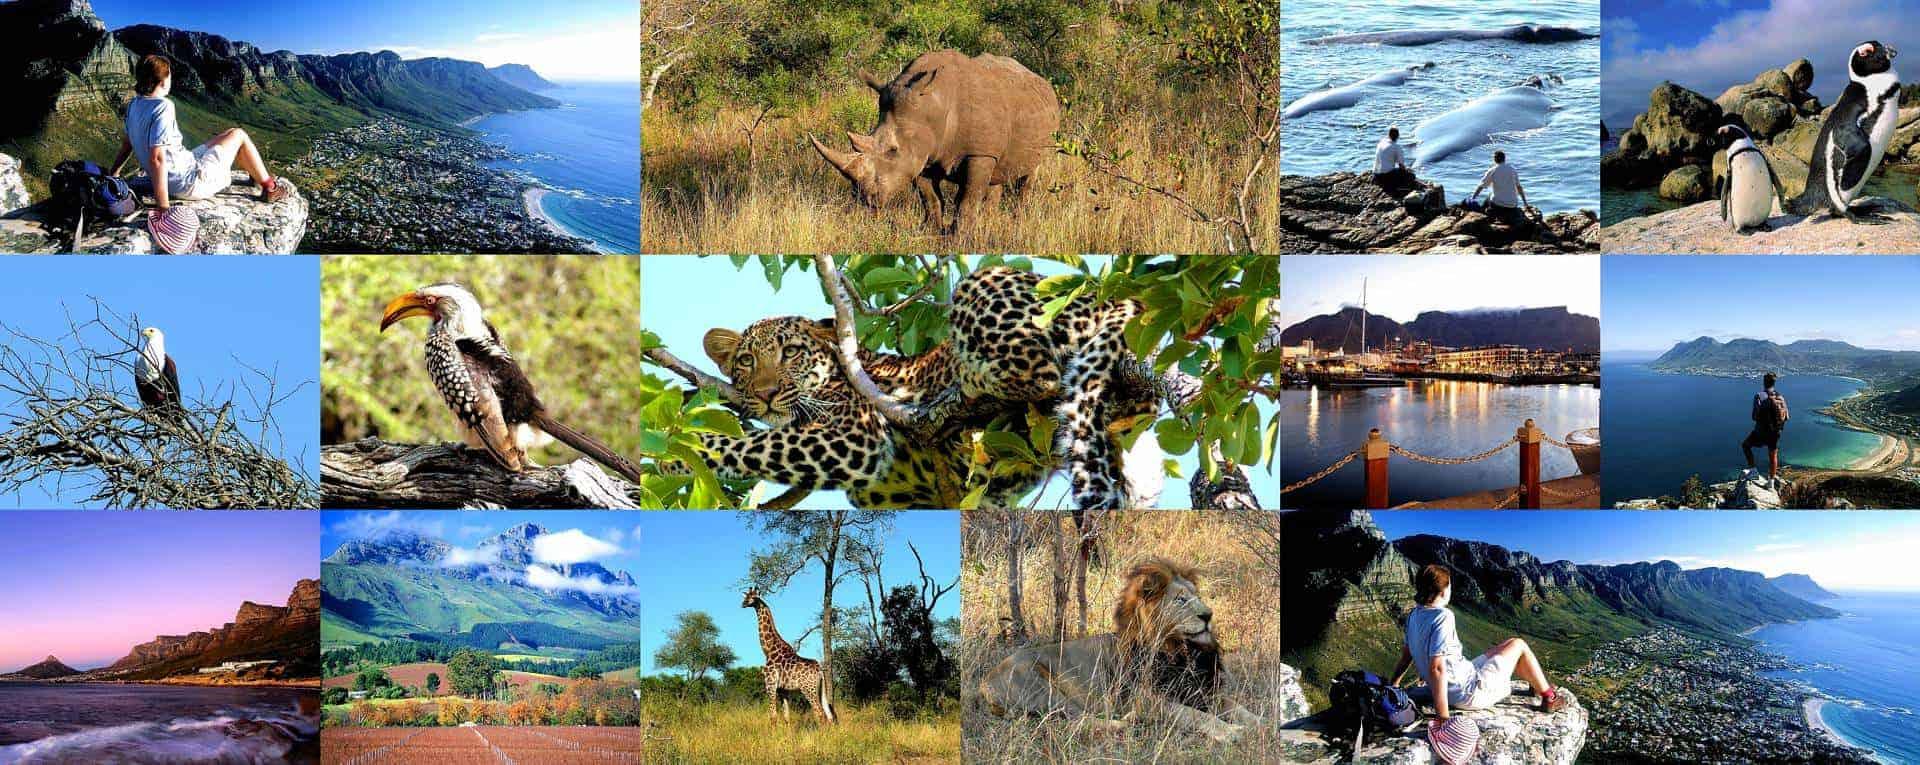 Safari Tour Guide Jobs